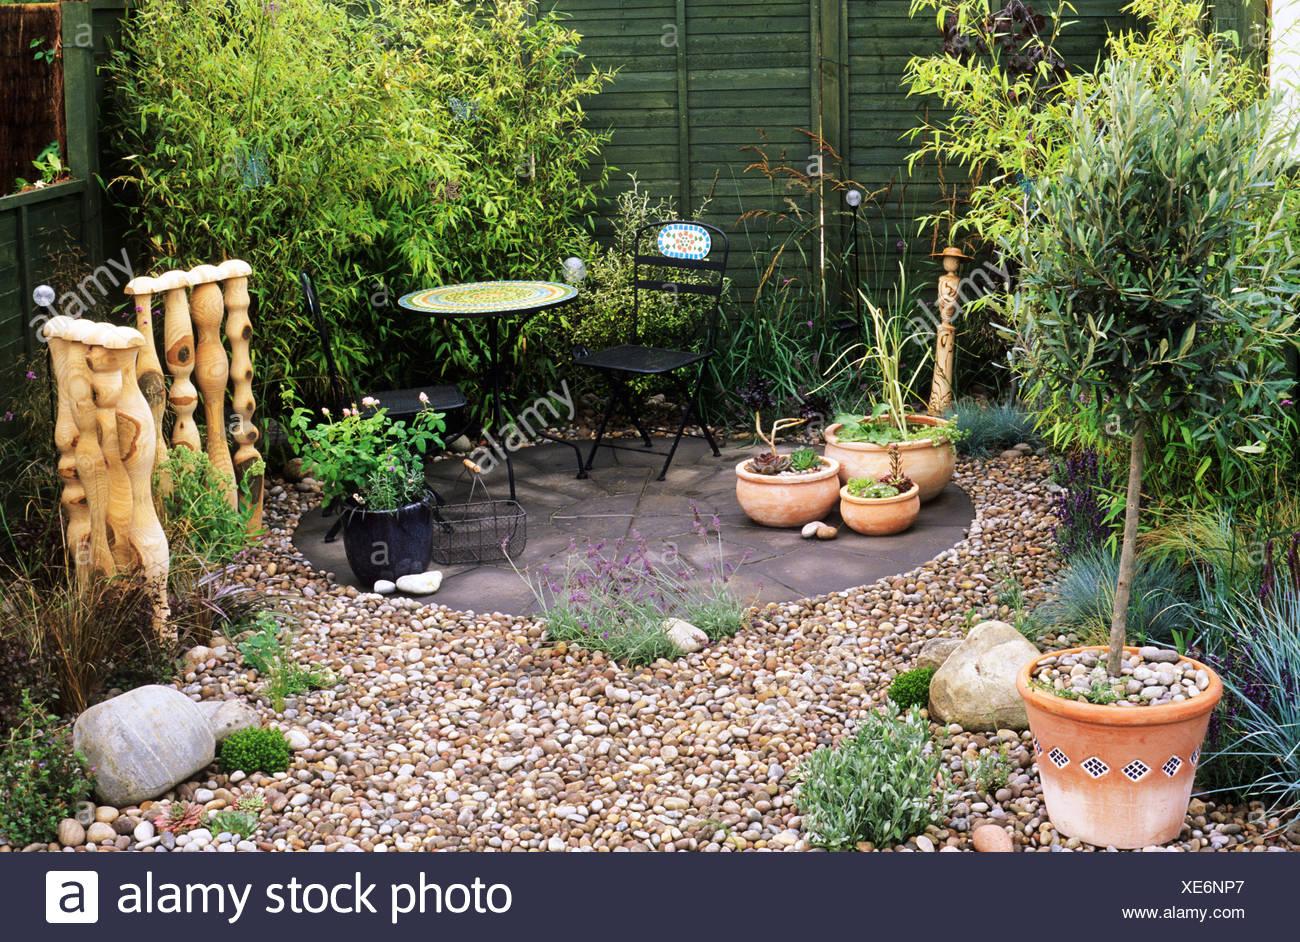 Jardin de galets avec bambou, Sandringham Flower Show, designer ...